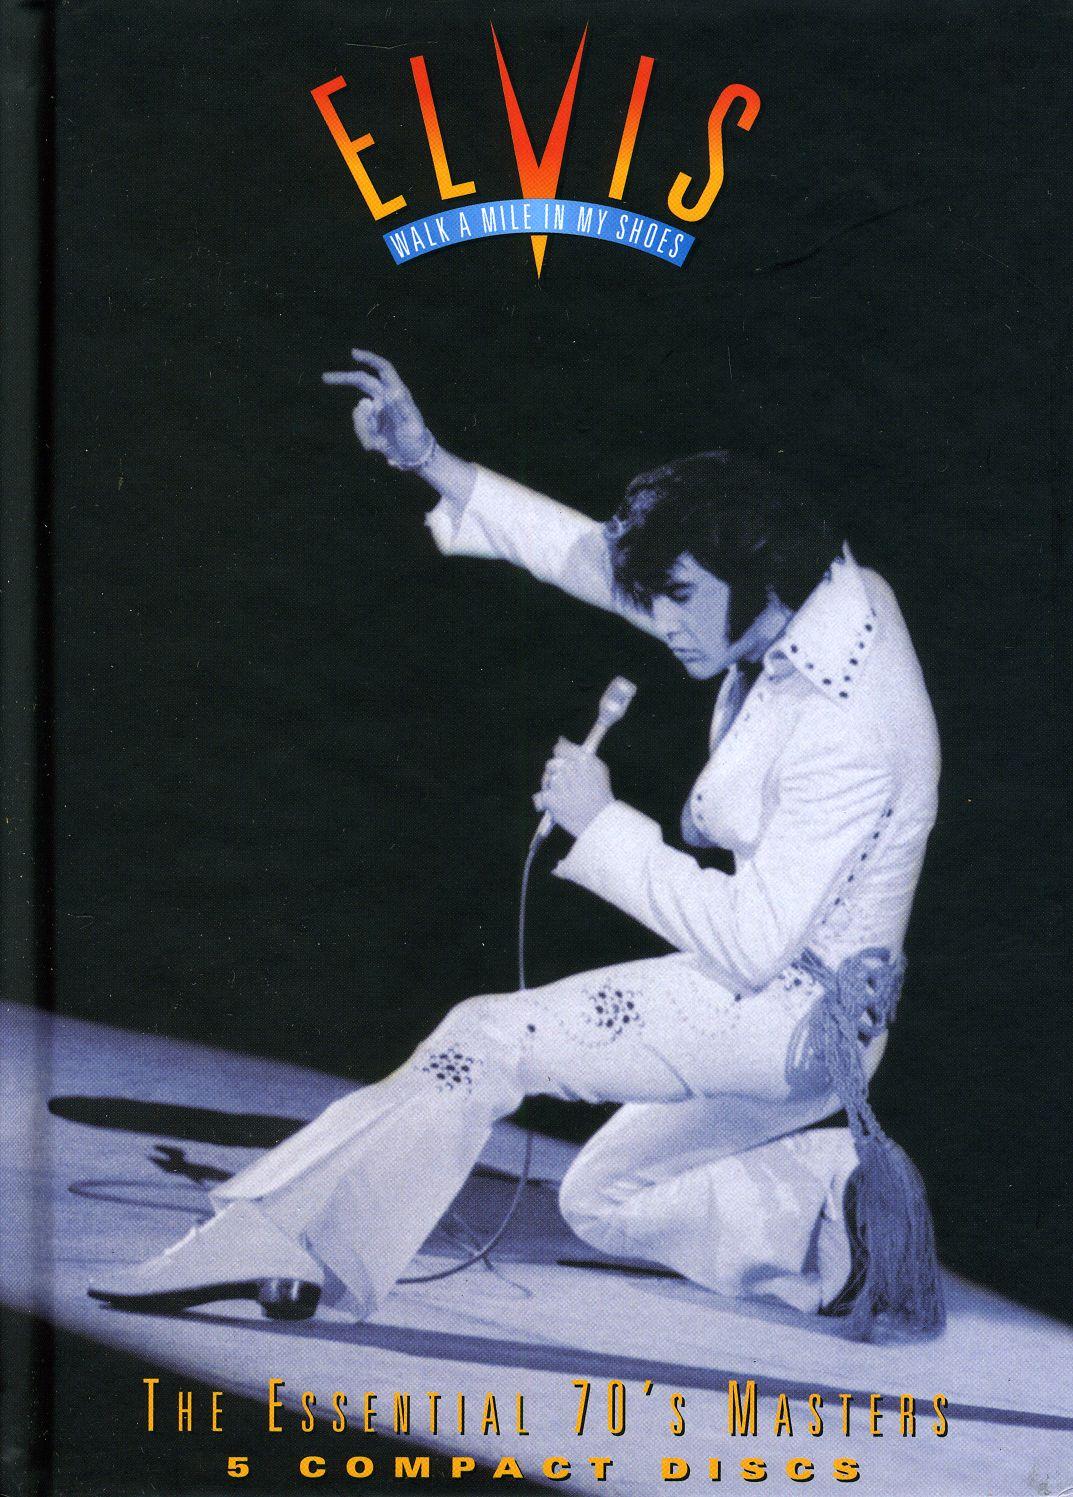 Elvis Presley - Walk A Mile In My Shoes: Essential 70's Masters